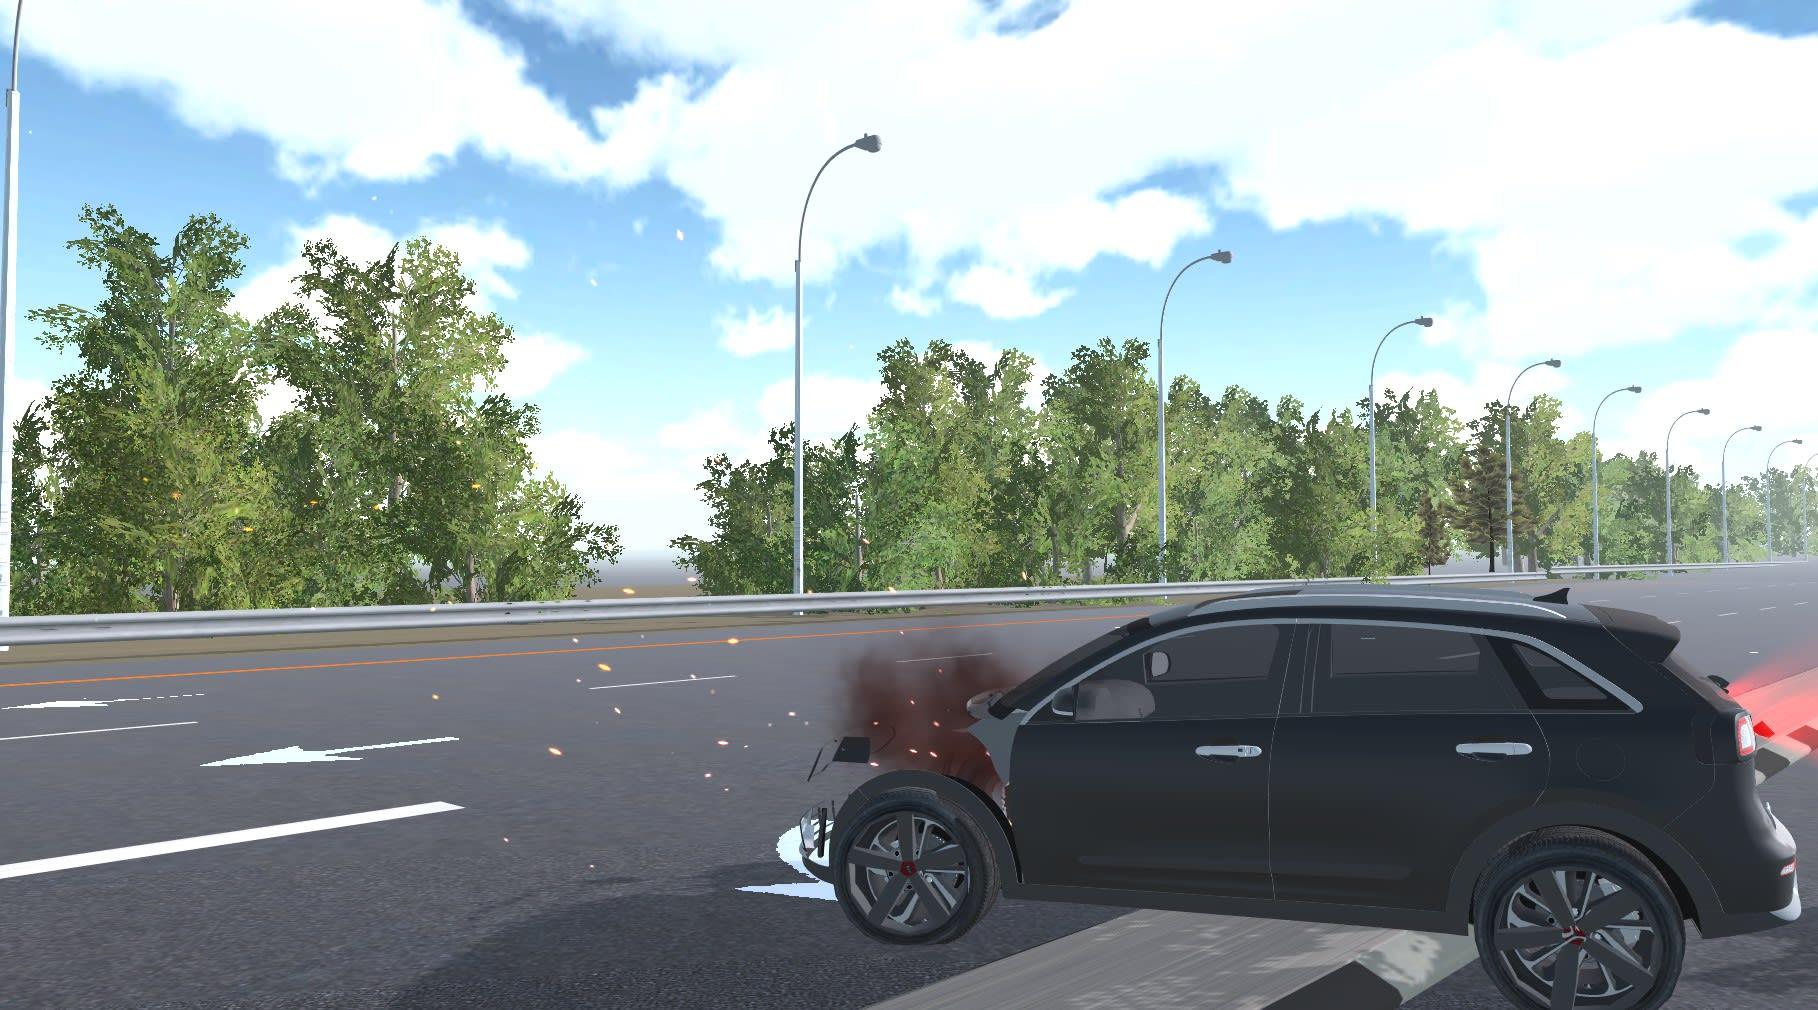 accident%20Kabri%203